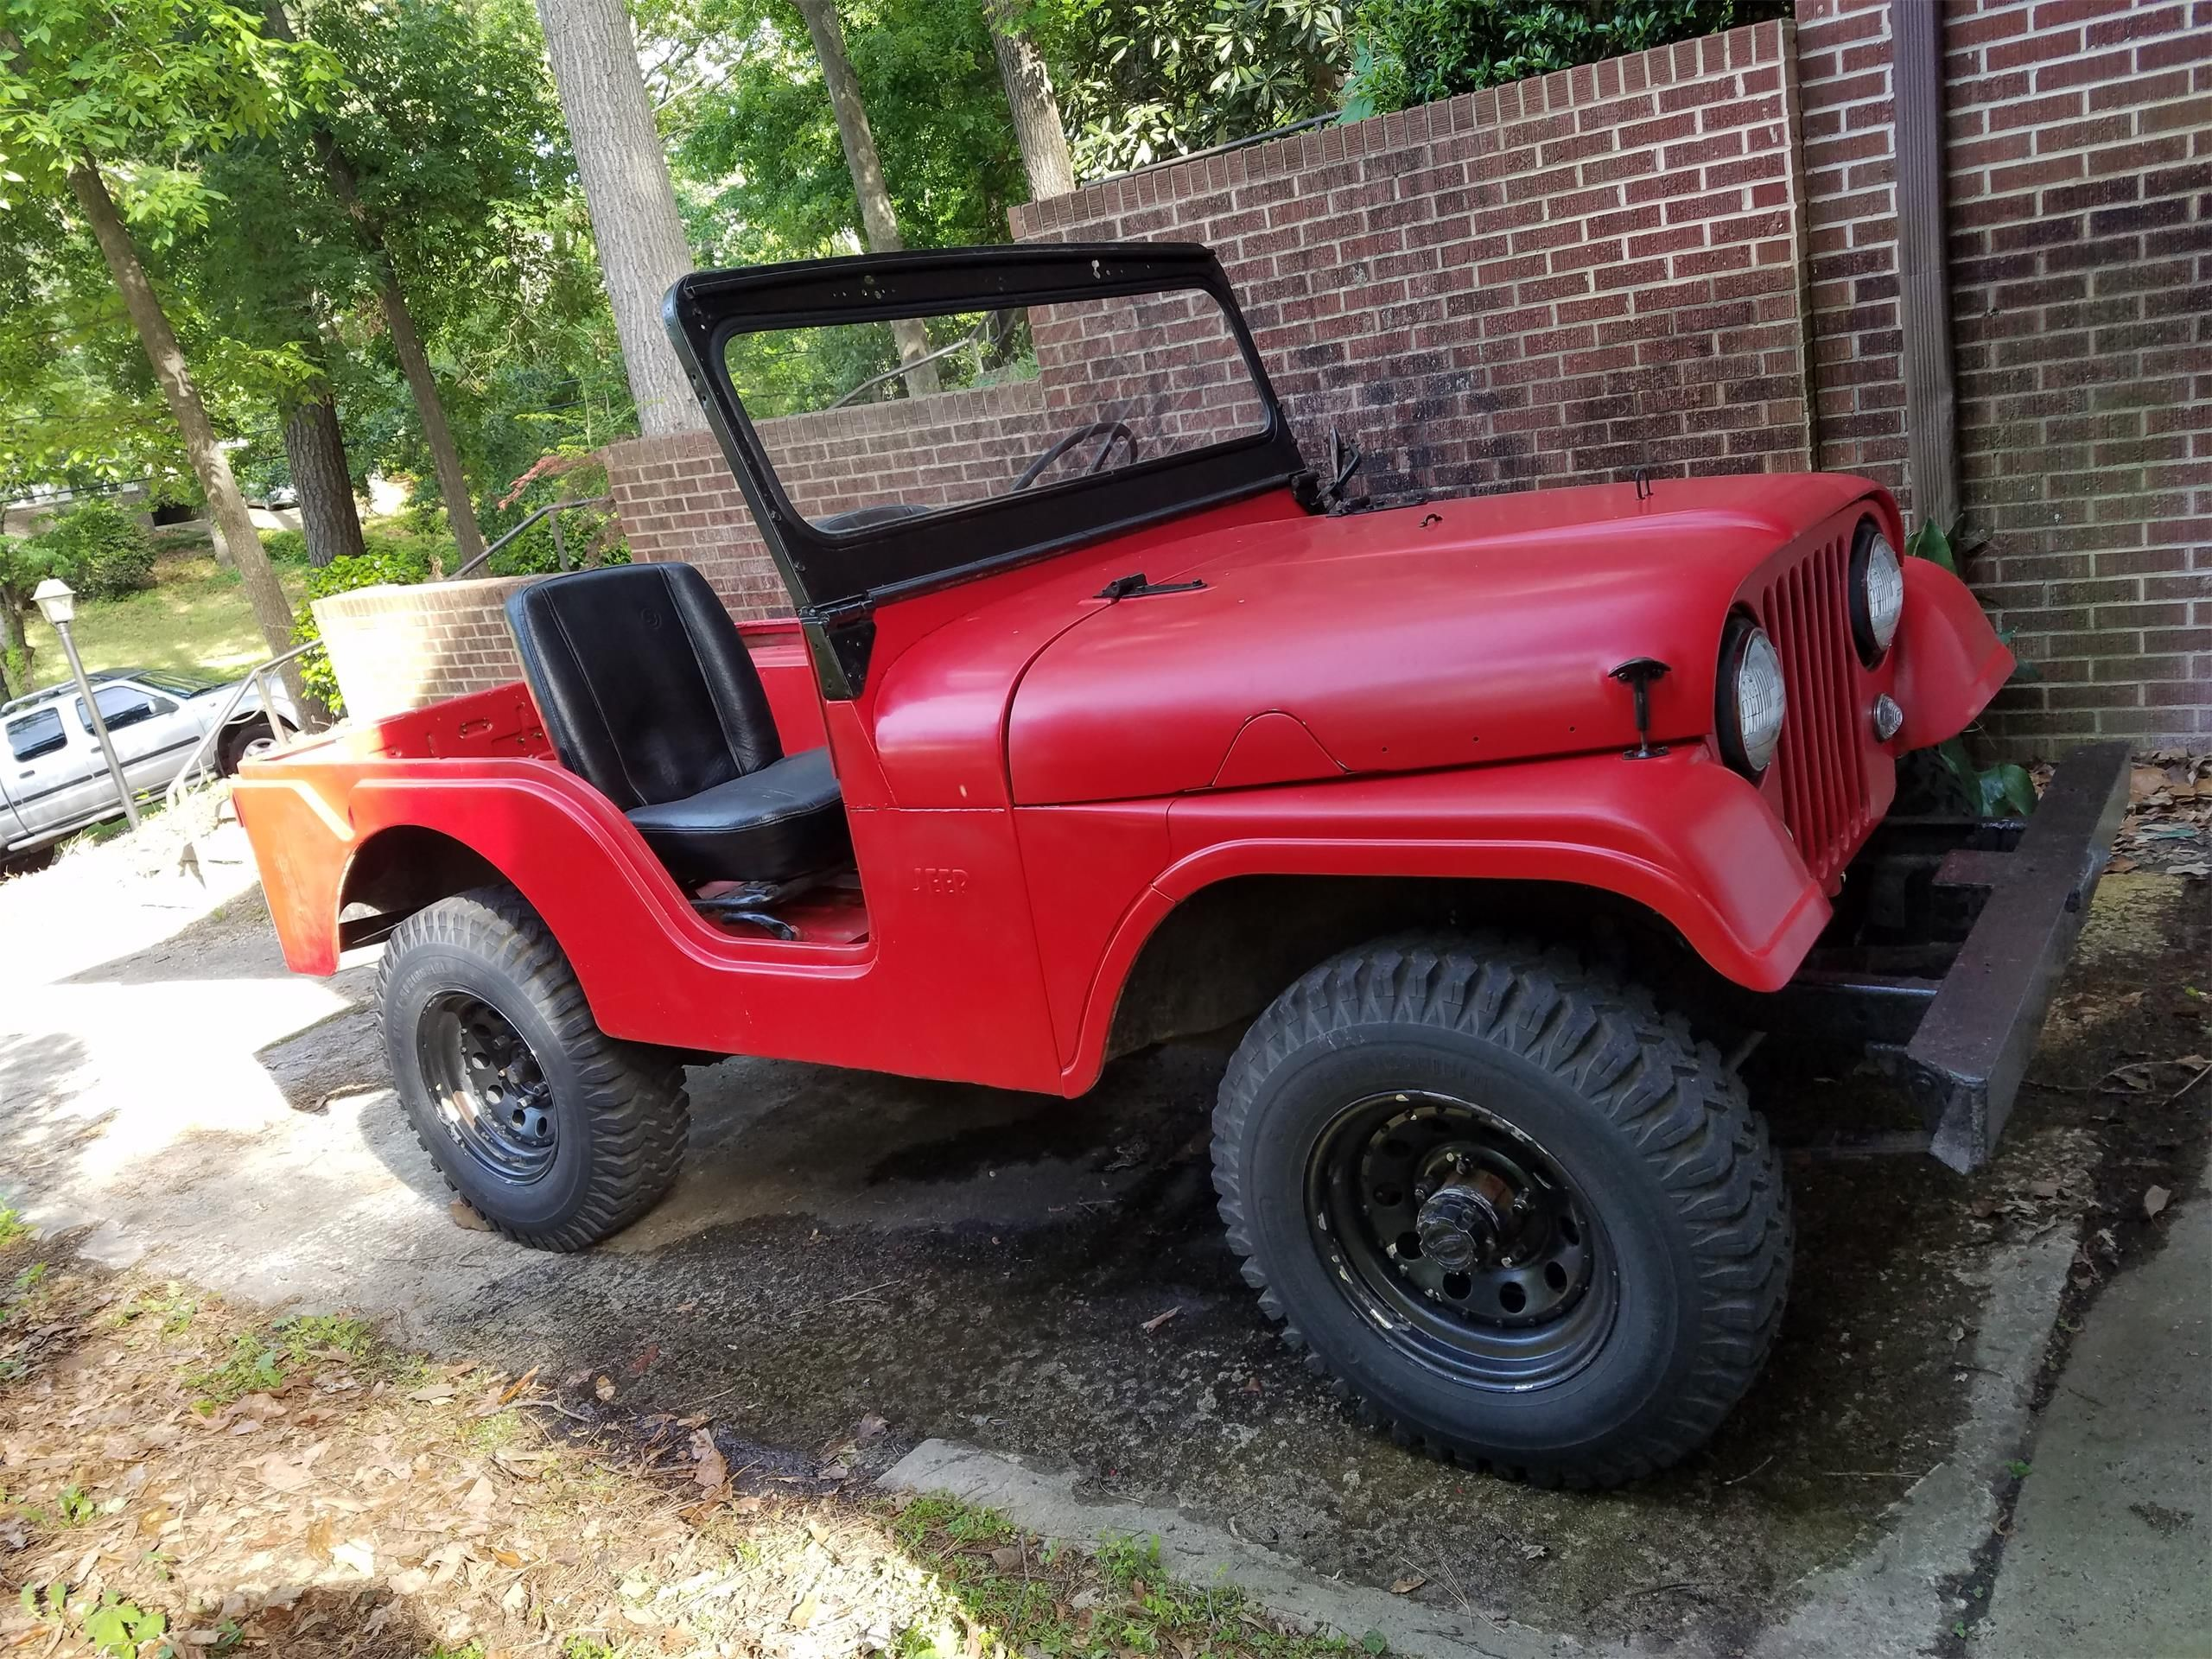 1966 Jeep Cj5 For Sale Listing Id Cc 1090038 Classiccars Com